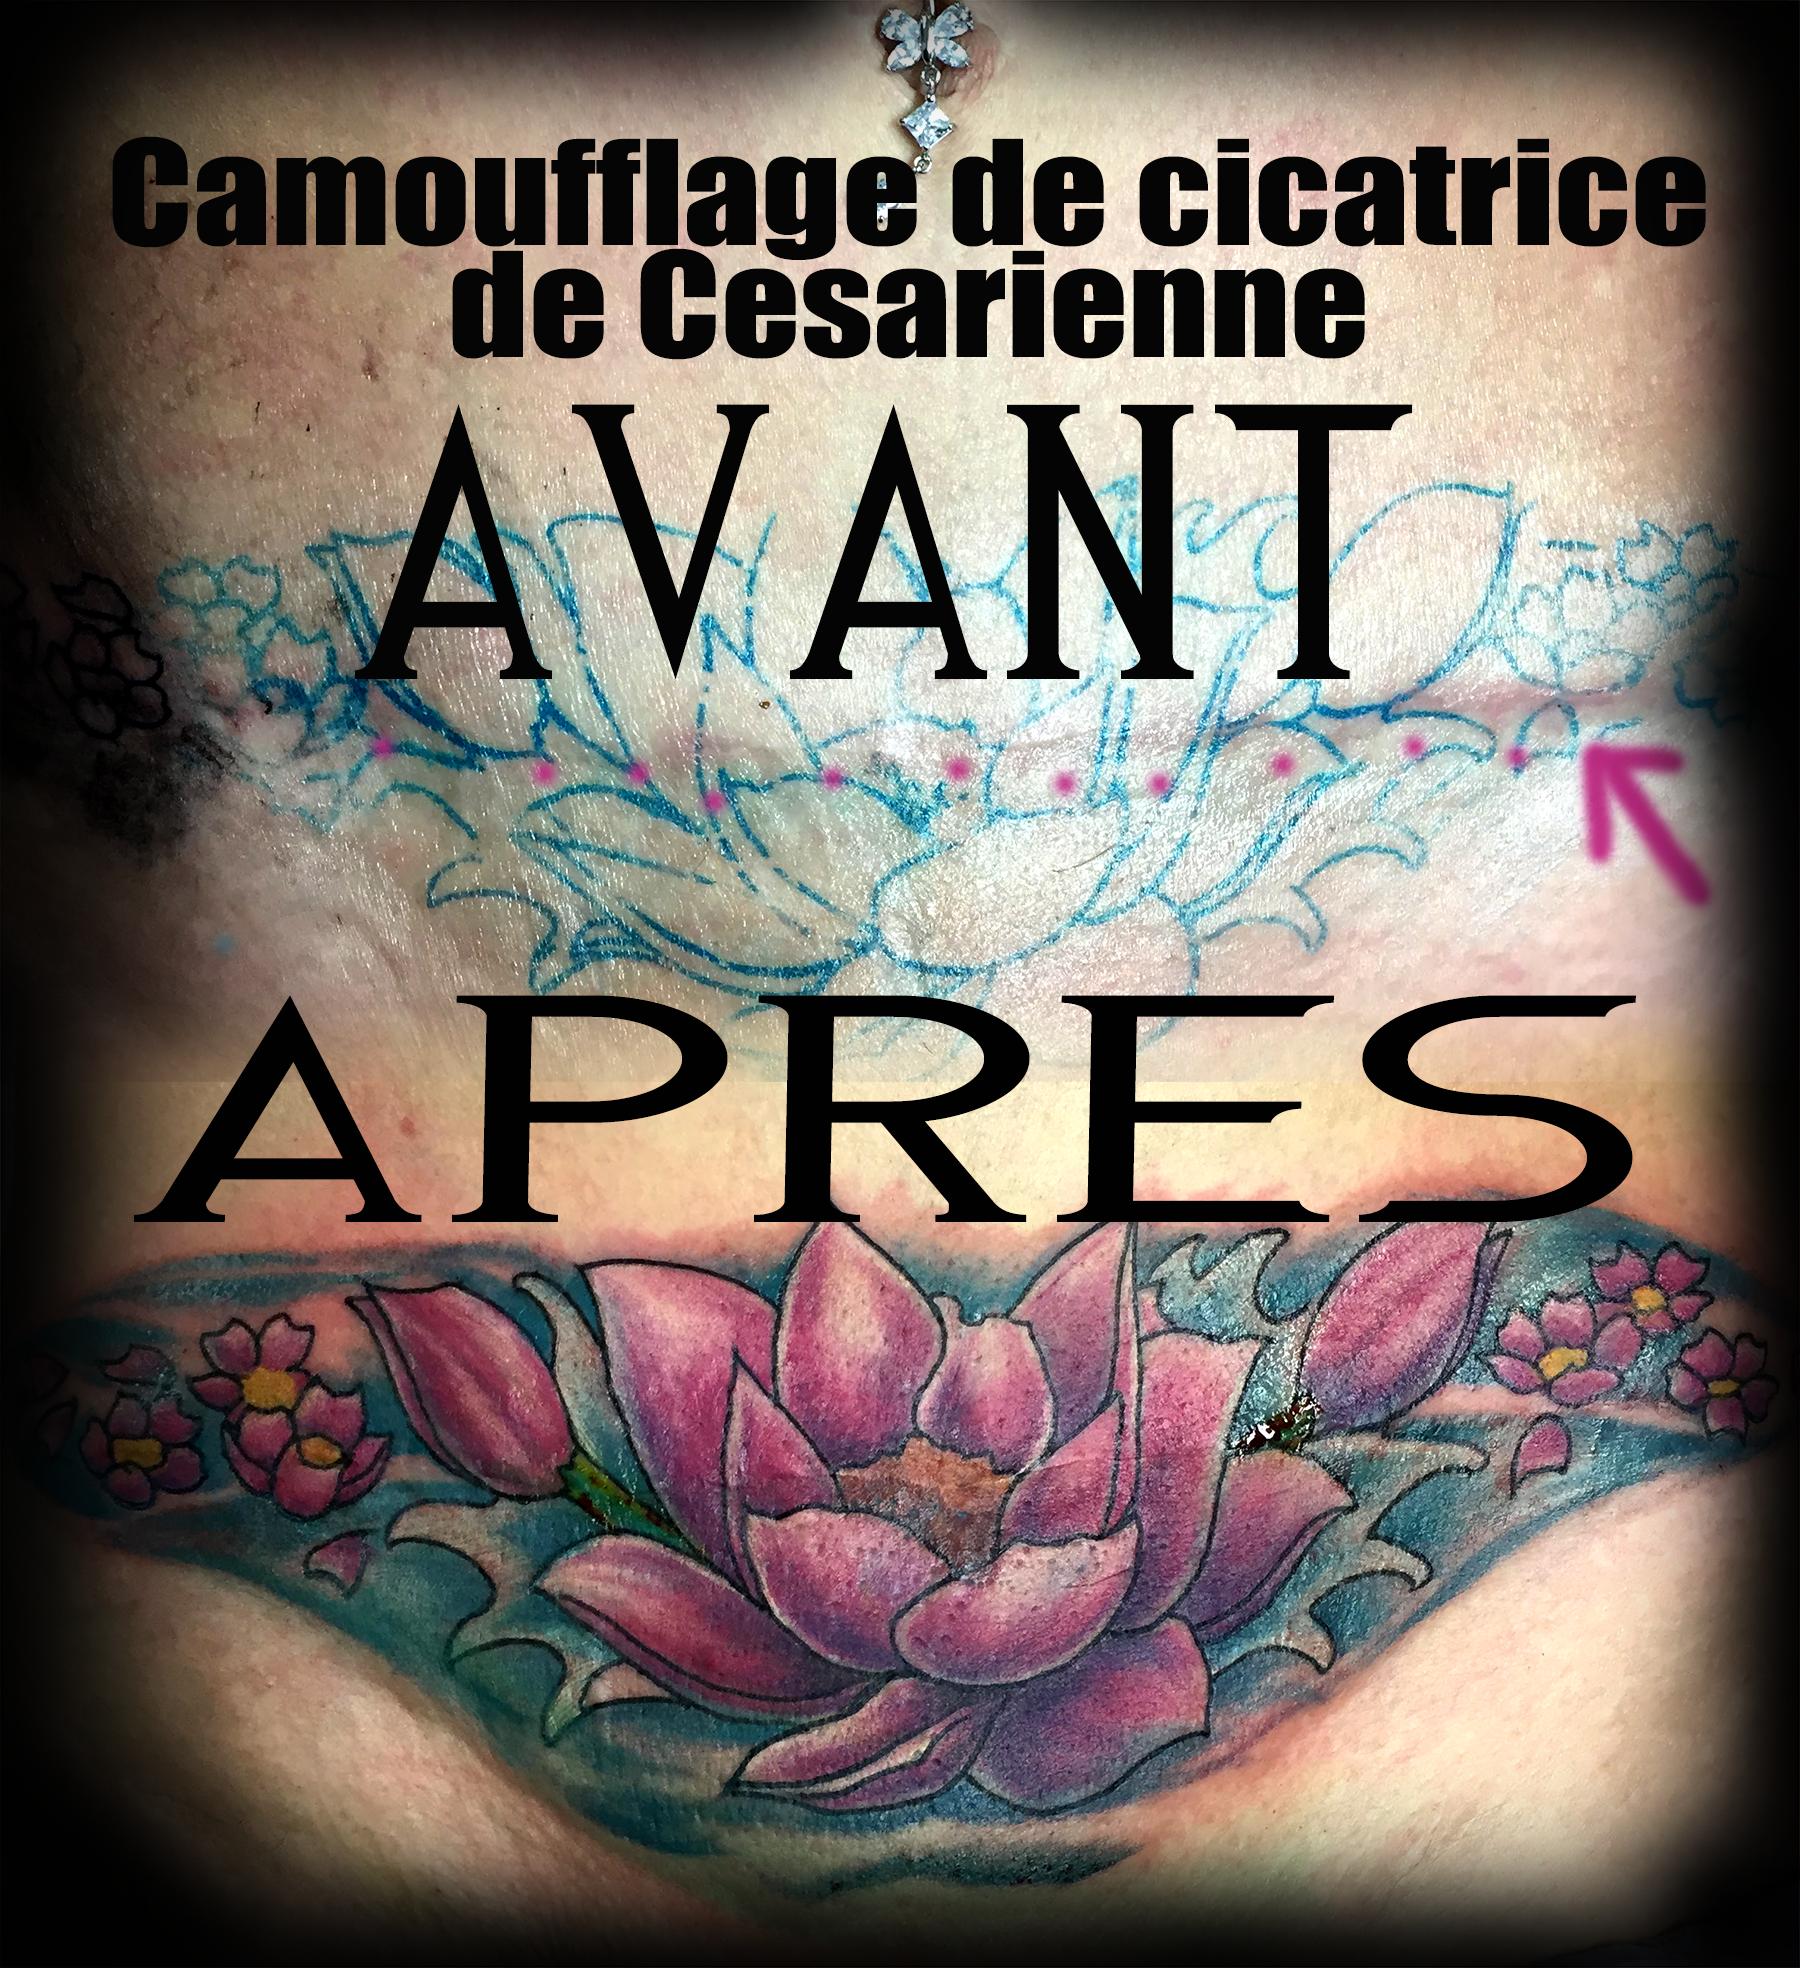 Lotus-bas-ventre-cicatrice-cesarienne